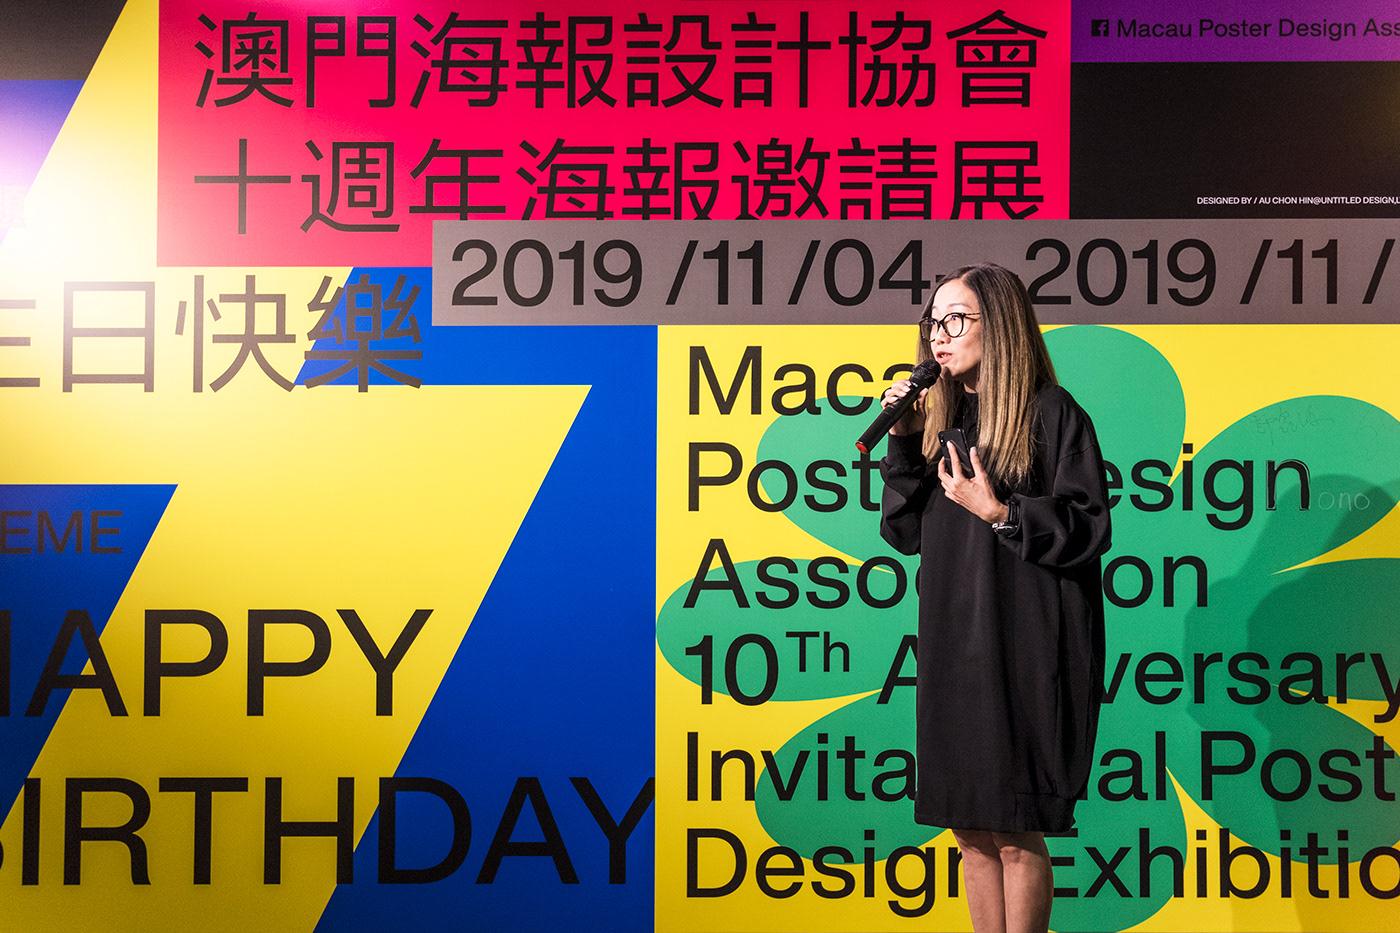 Macao macau Macaudesign macaodesigner graphic untitledmacao untitleddesign auchonhin 歐俊軒 Exhibition